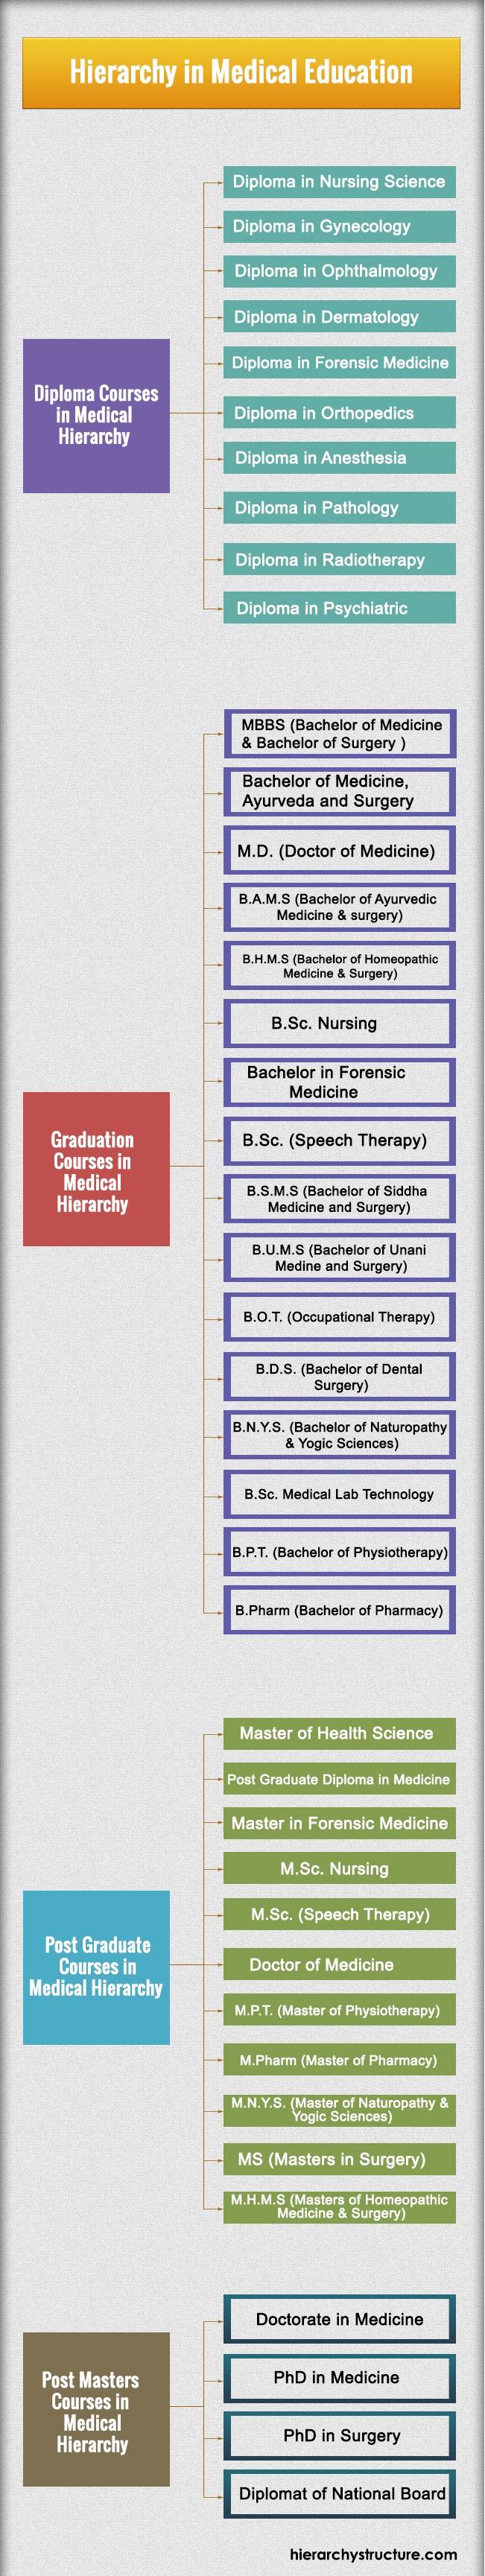 Hierarchy in Medical Education